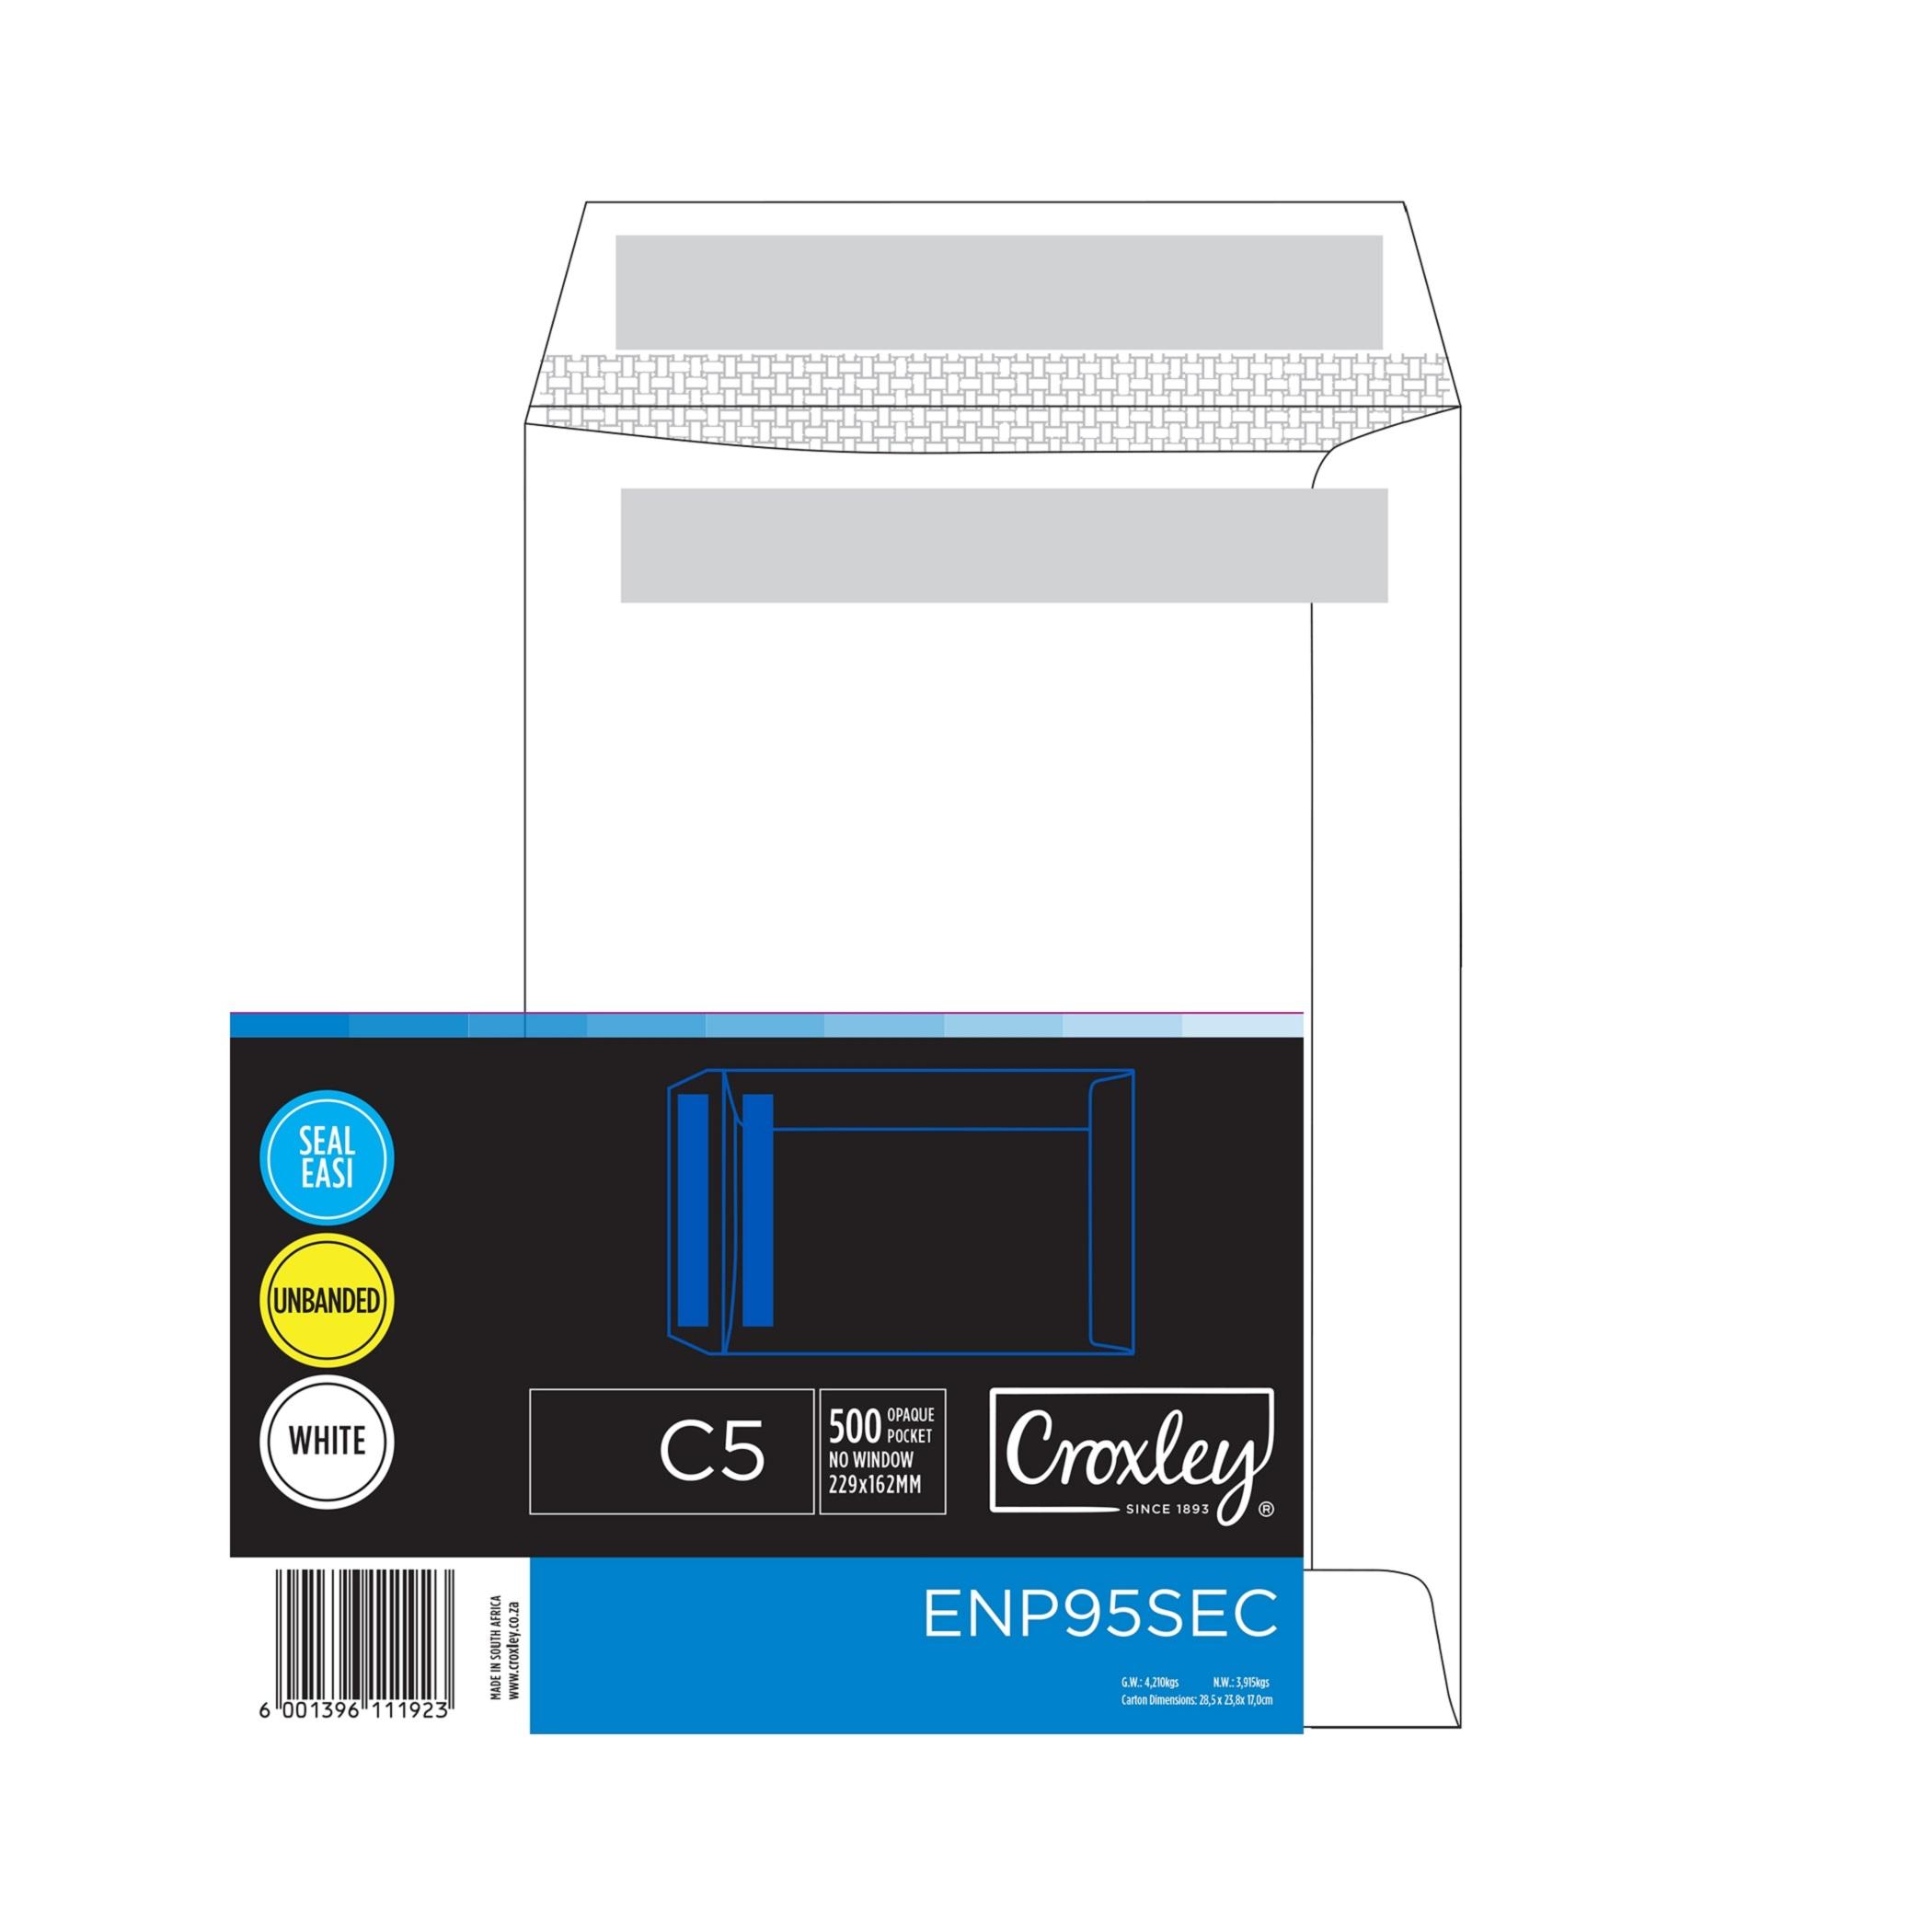 ENVELOPE C5 WHITE BOX OF 500